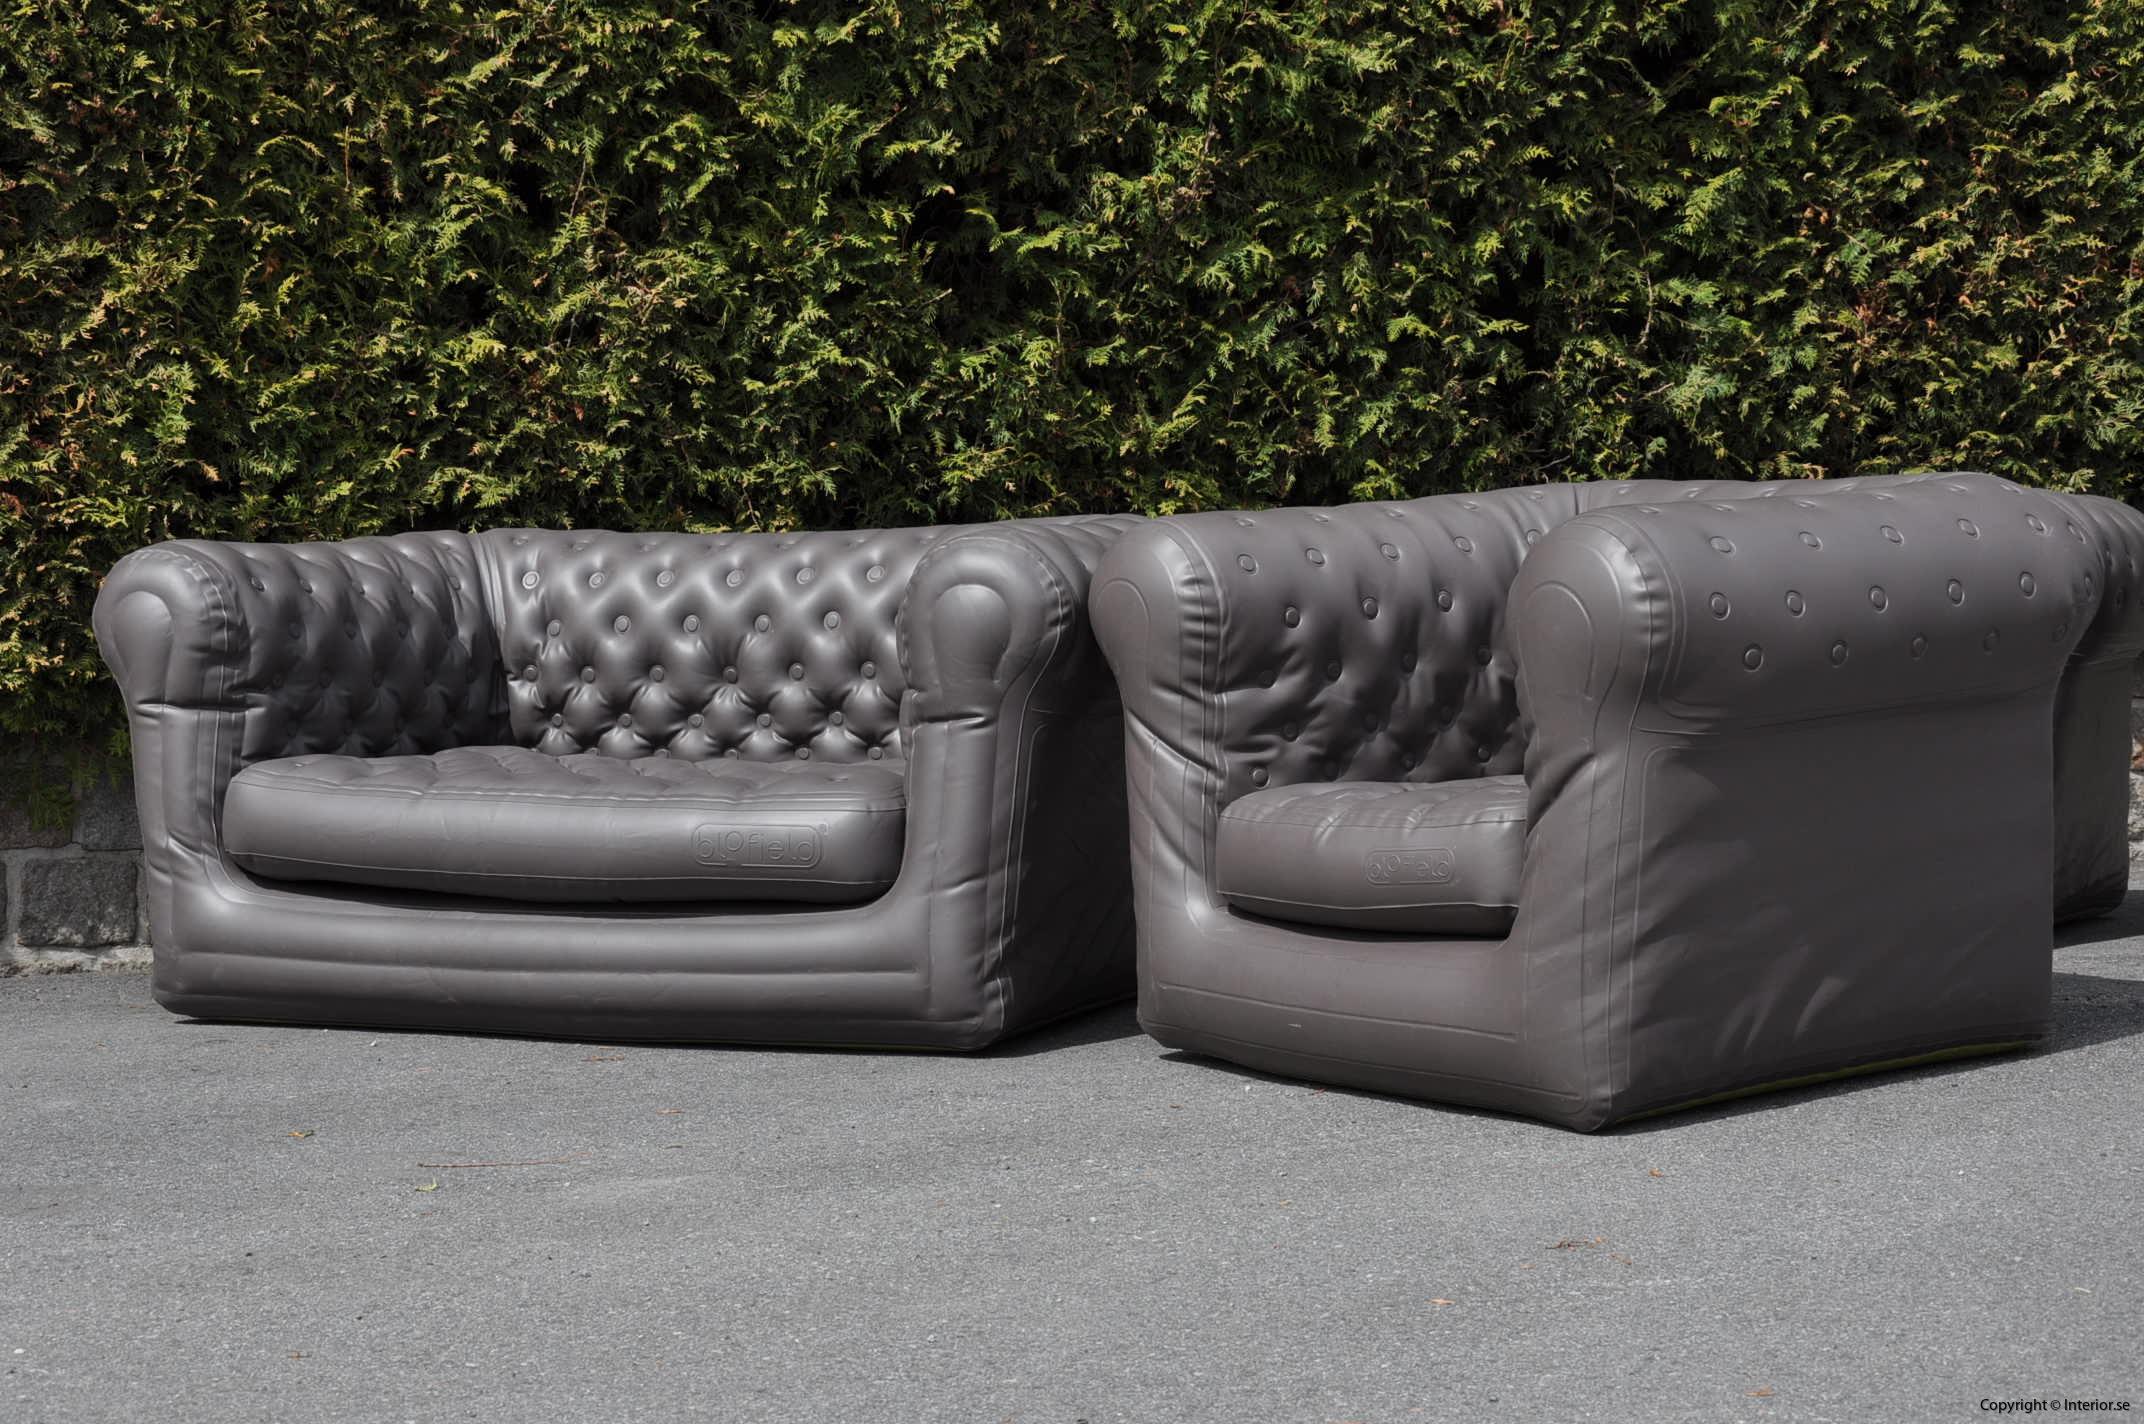 hyra uppblåsbara möbler hyr möbler event stockholm blofield furniture event sweden (4)